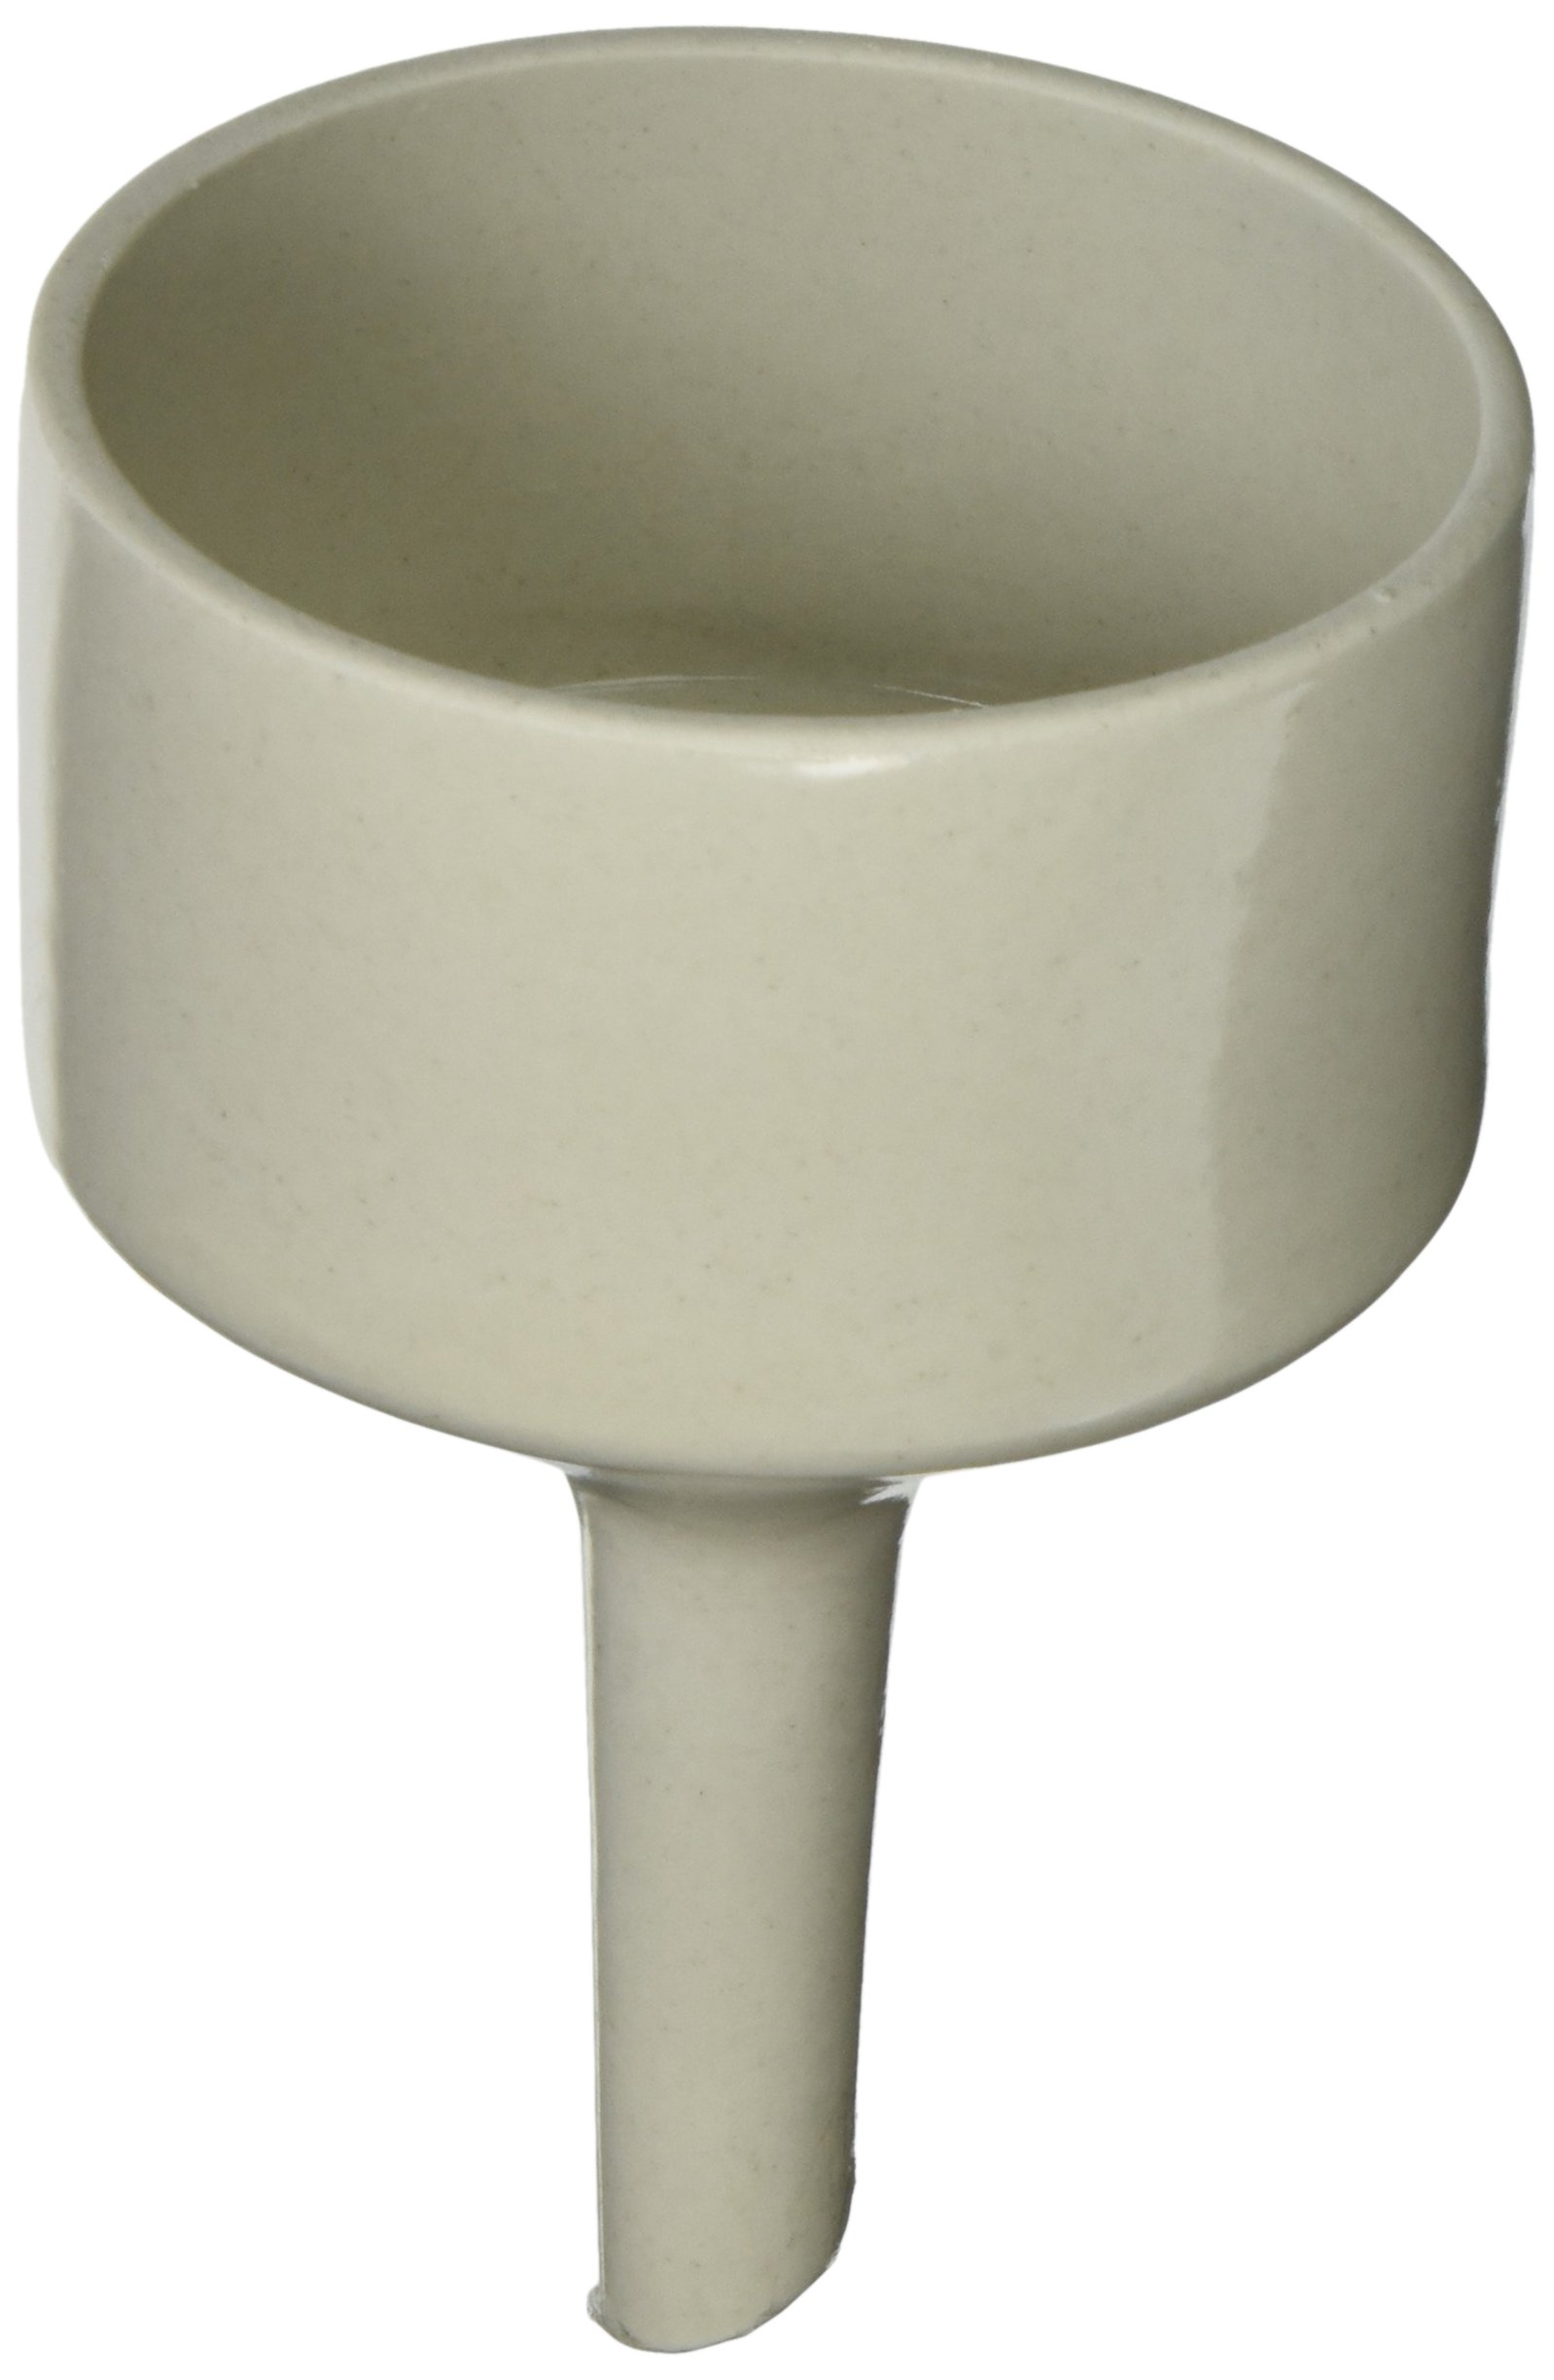 GSC International 4-6054 Porcelain Buchner Funnel, 100 mm x 30 mm by GSC International